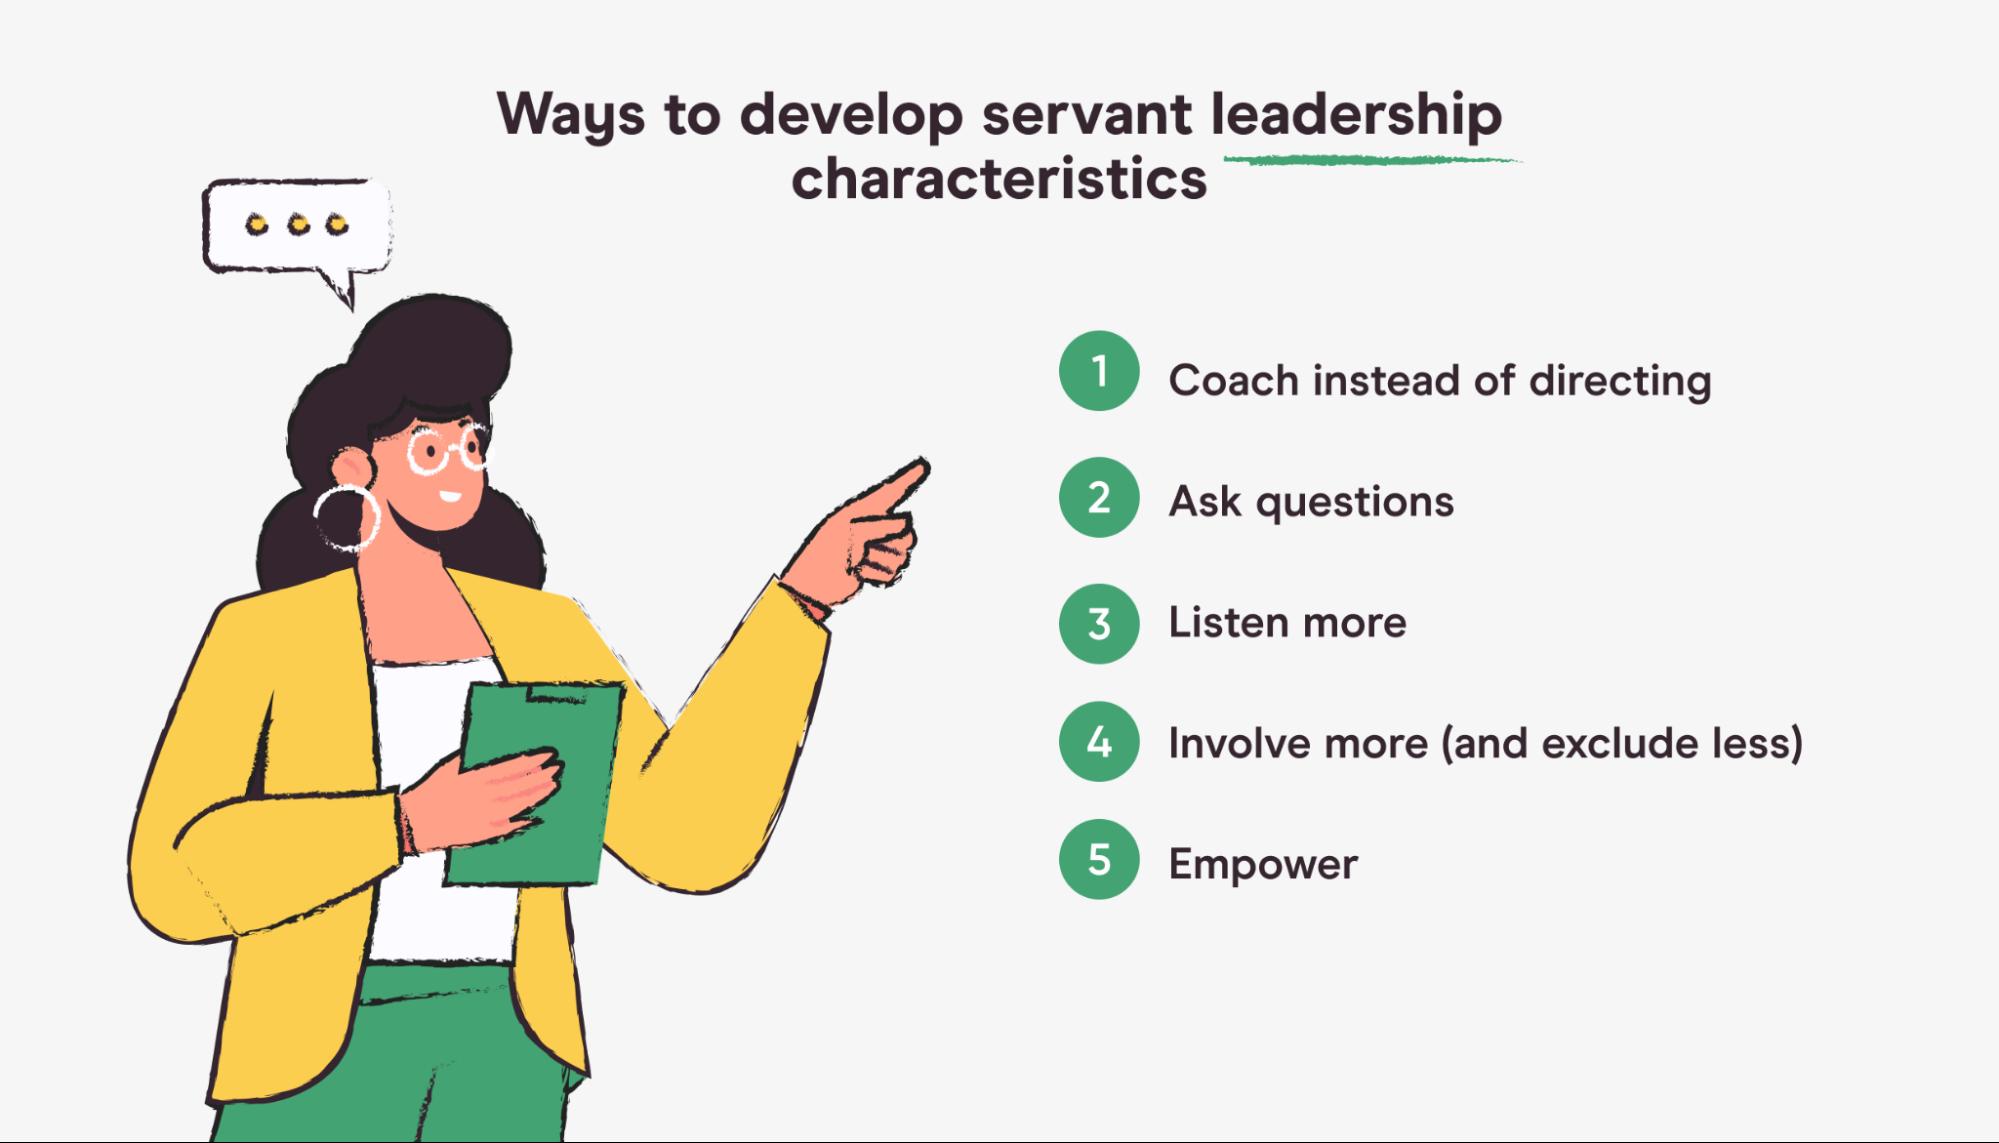 ways to develop servant leadership characteristics